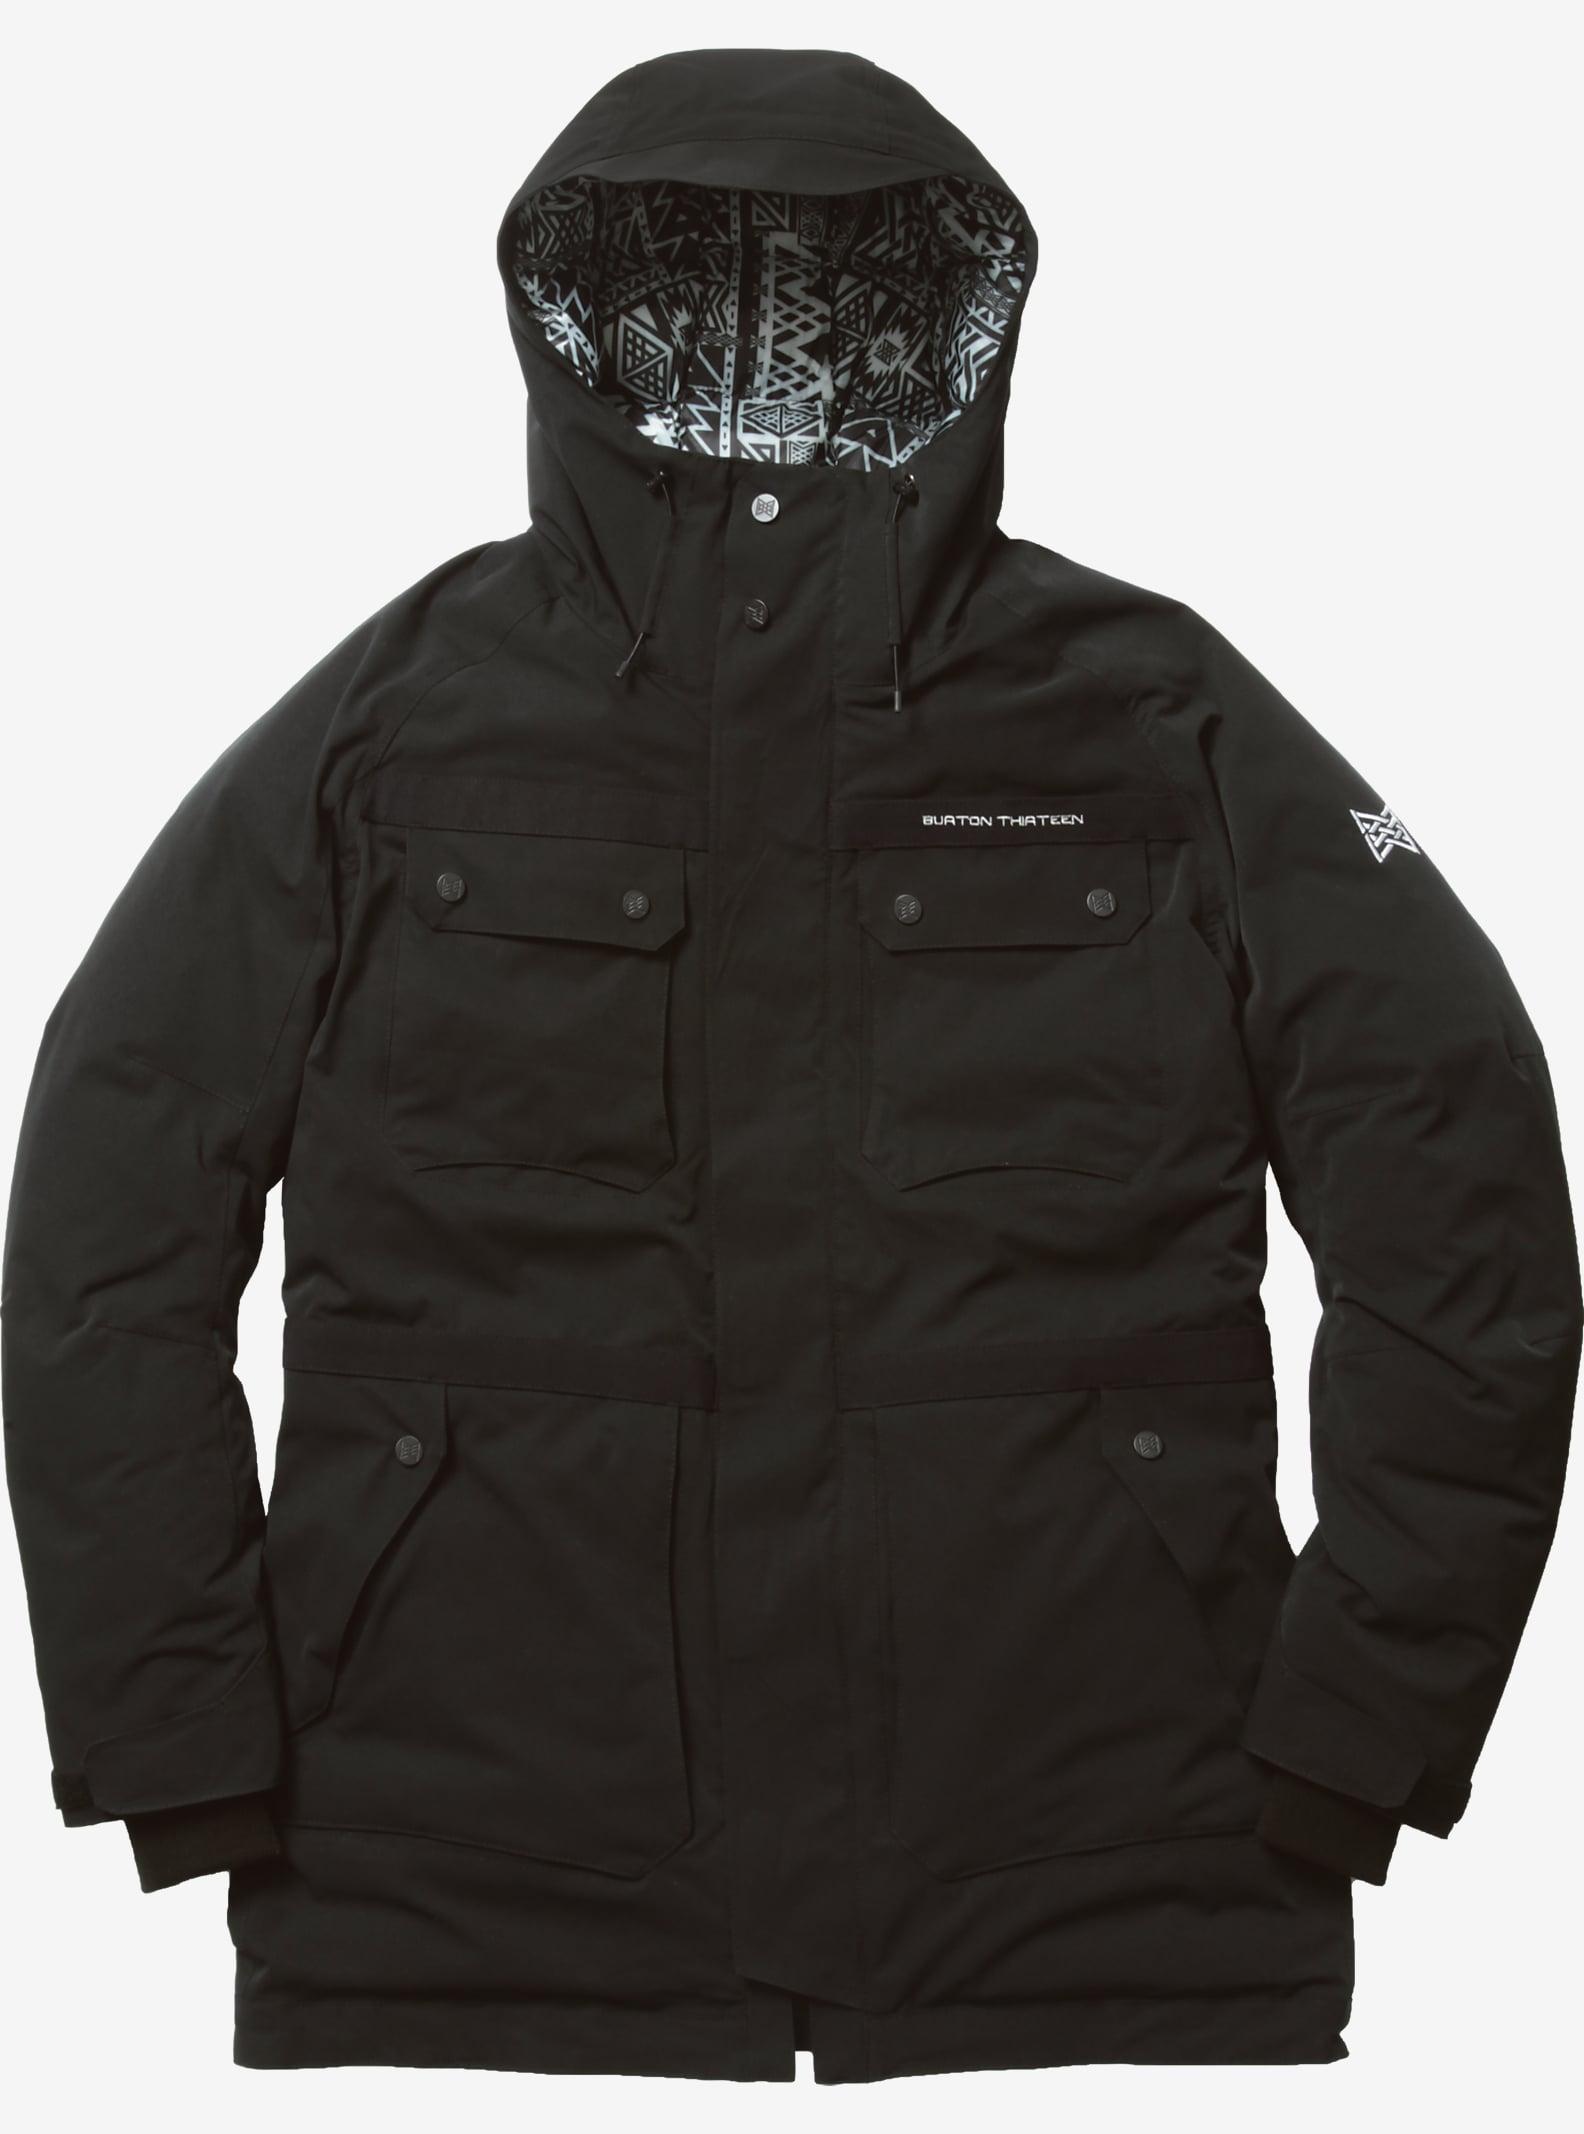 Burton THIRTEEN Serape Jacket shown in Black